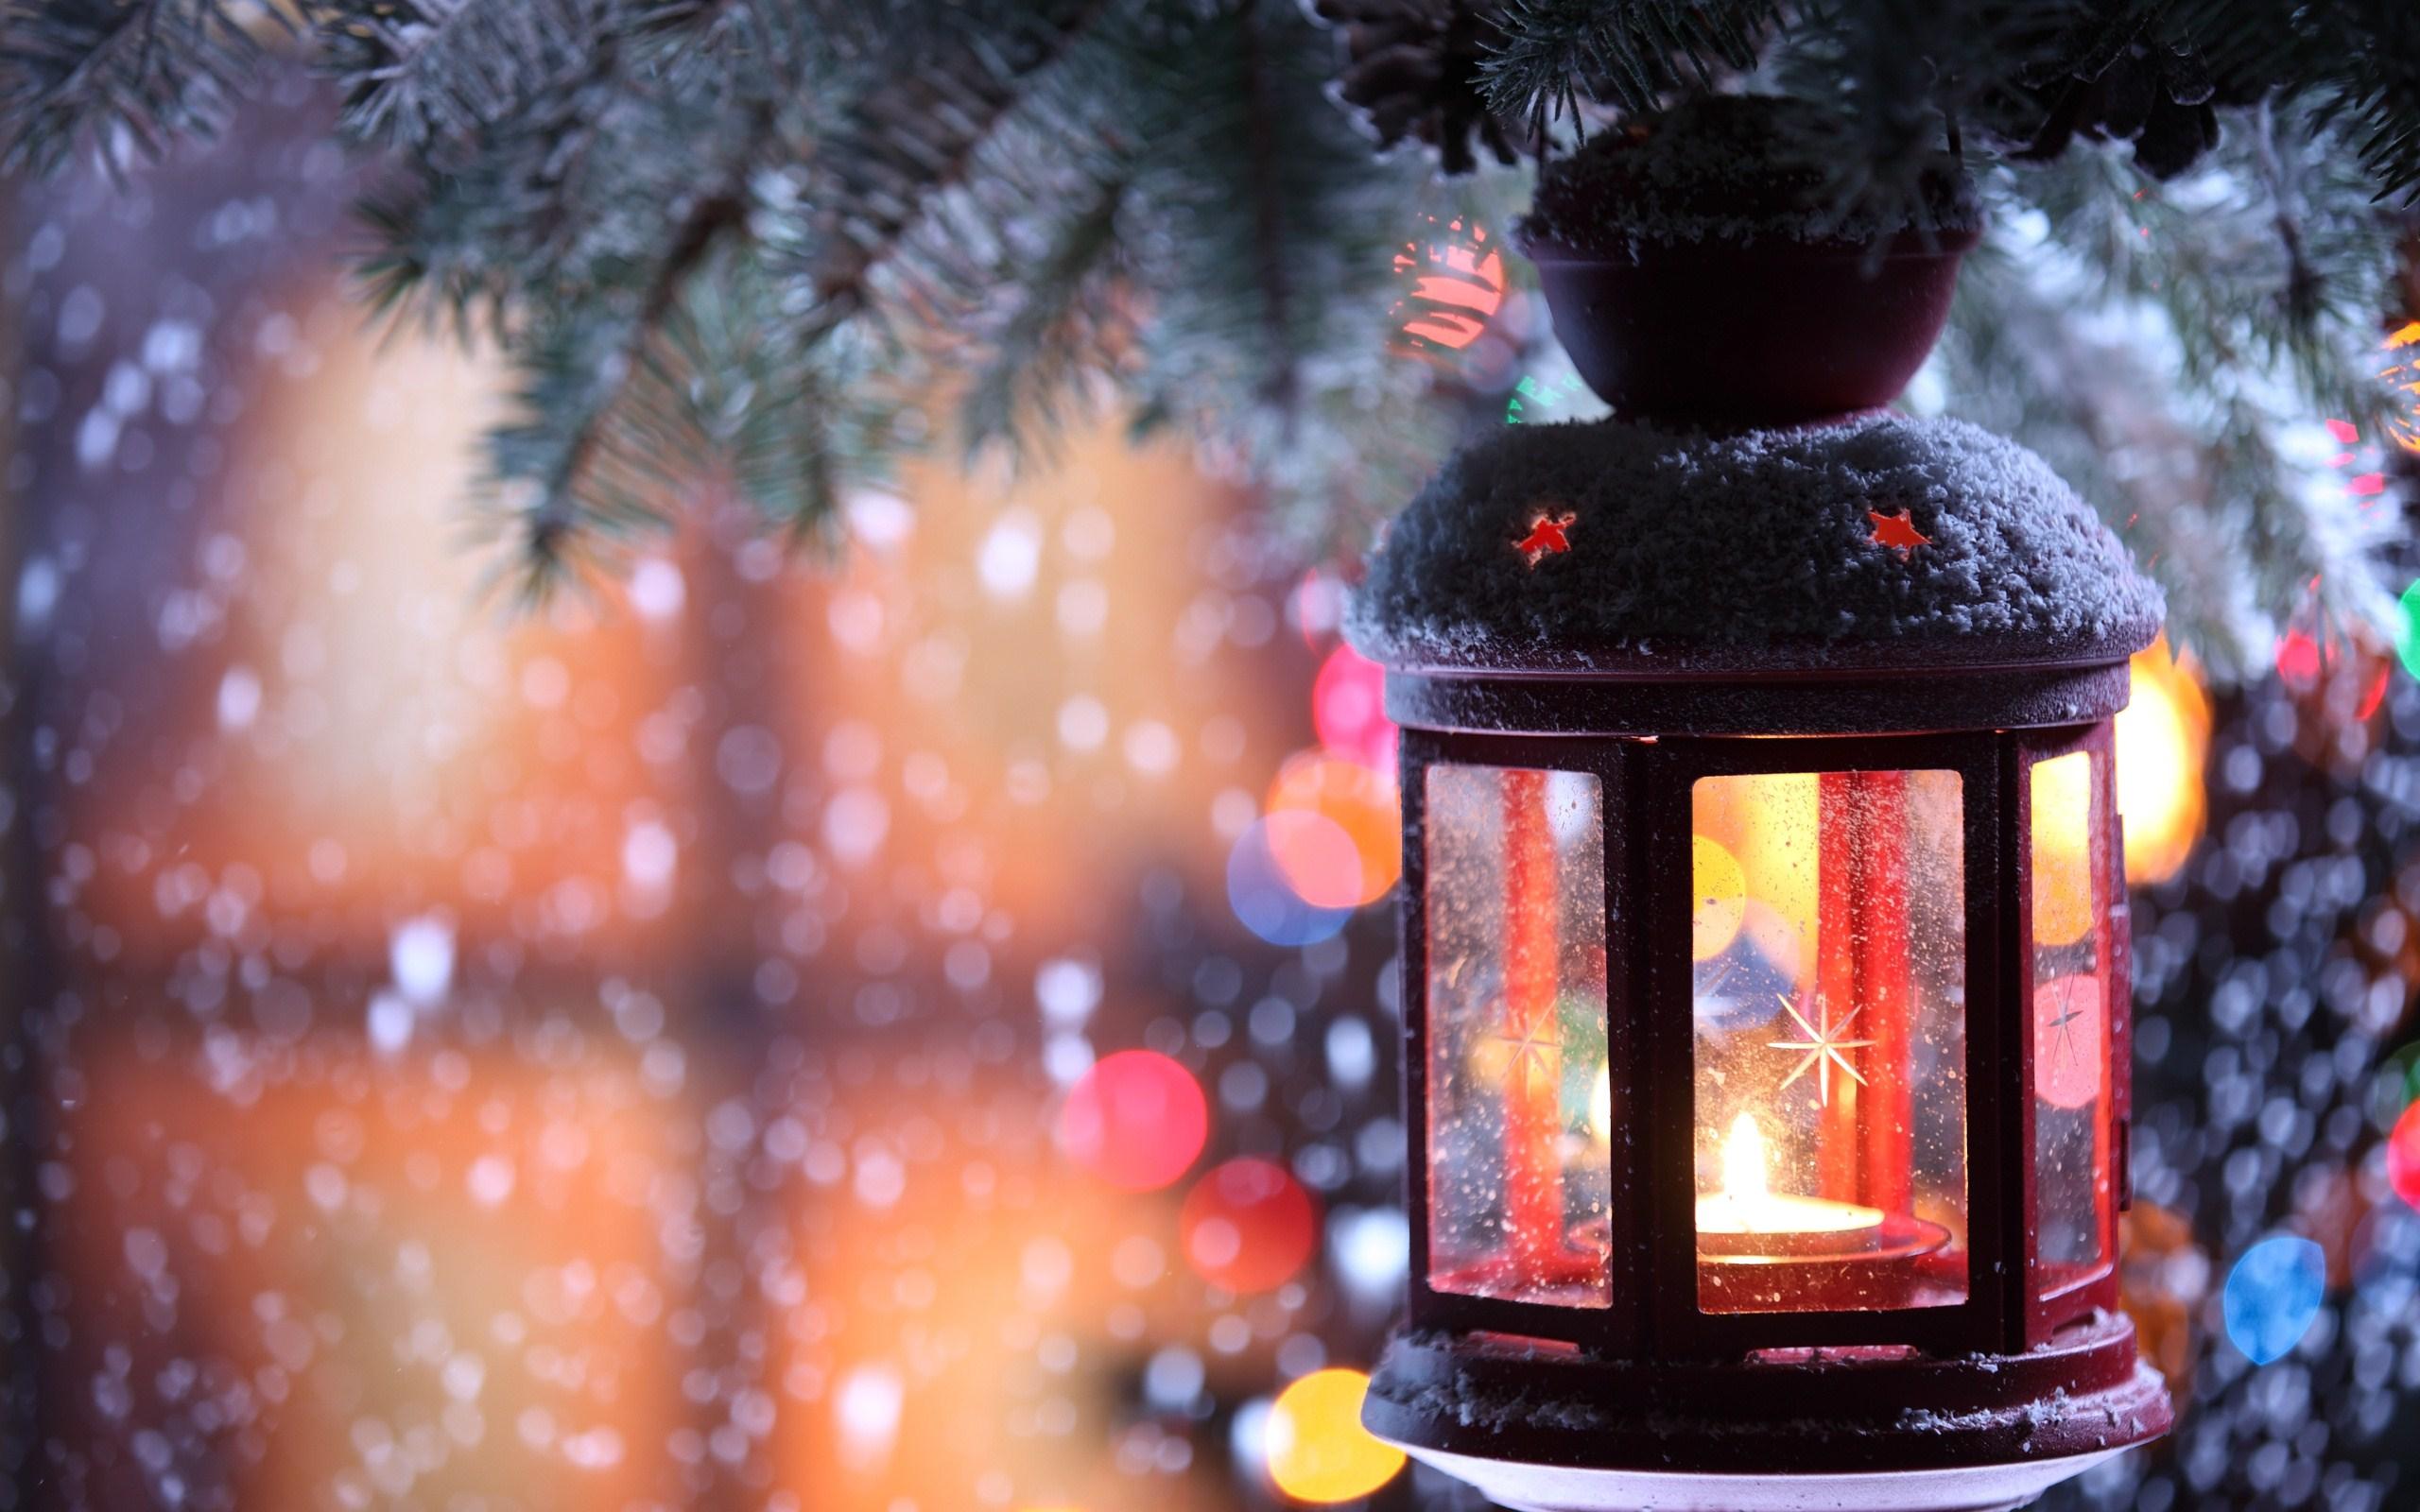 Christmas Tree Snow Wallpaper - WallpaperSafari